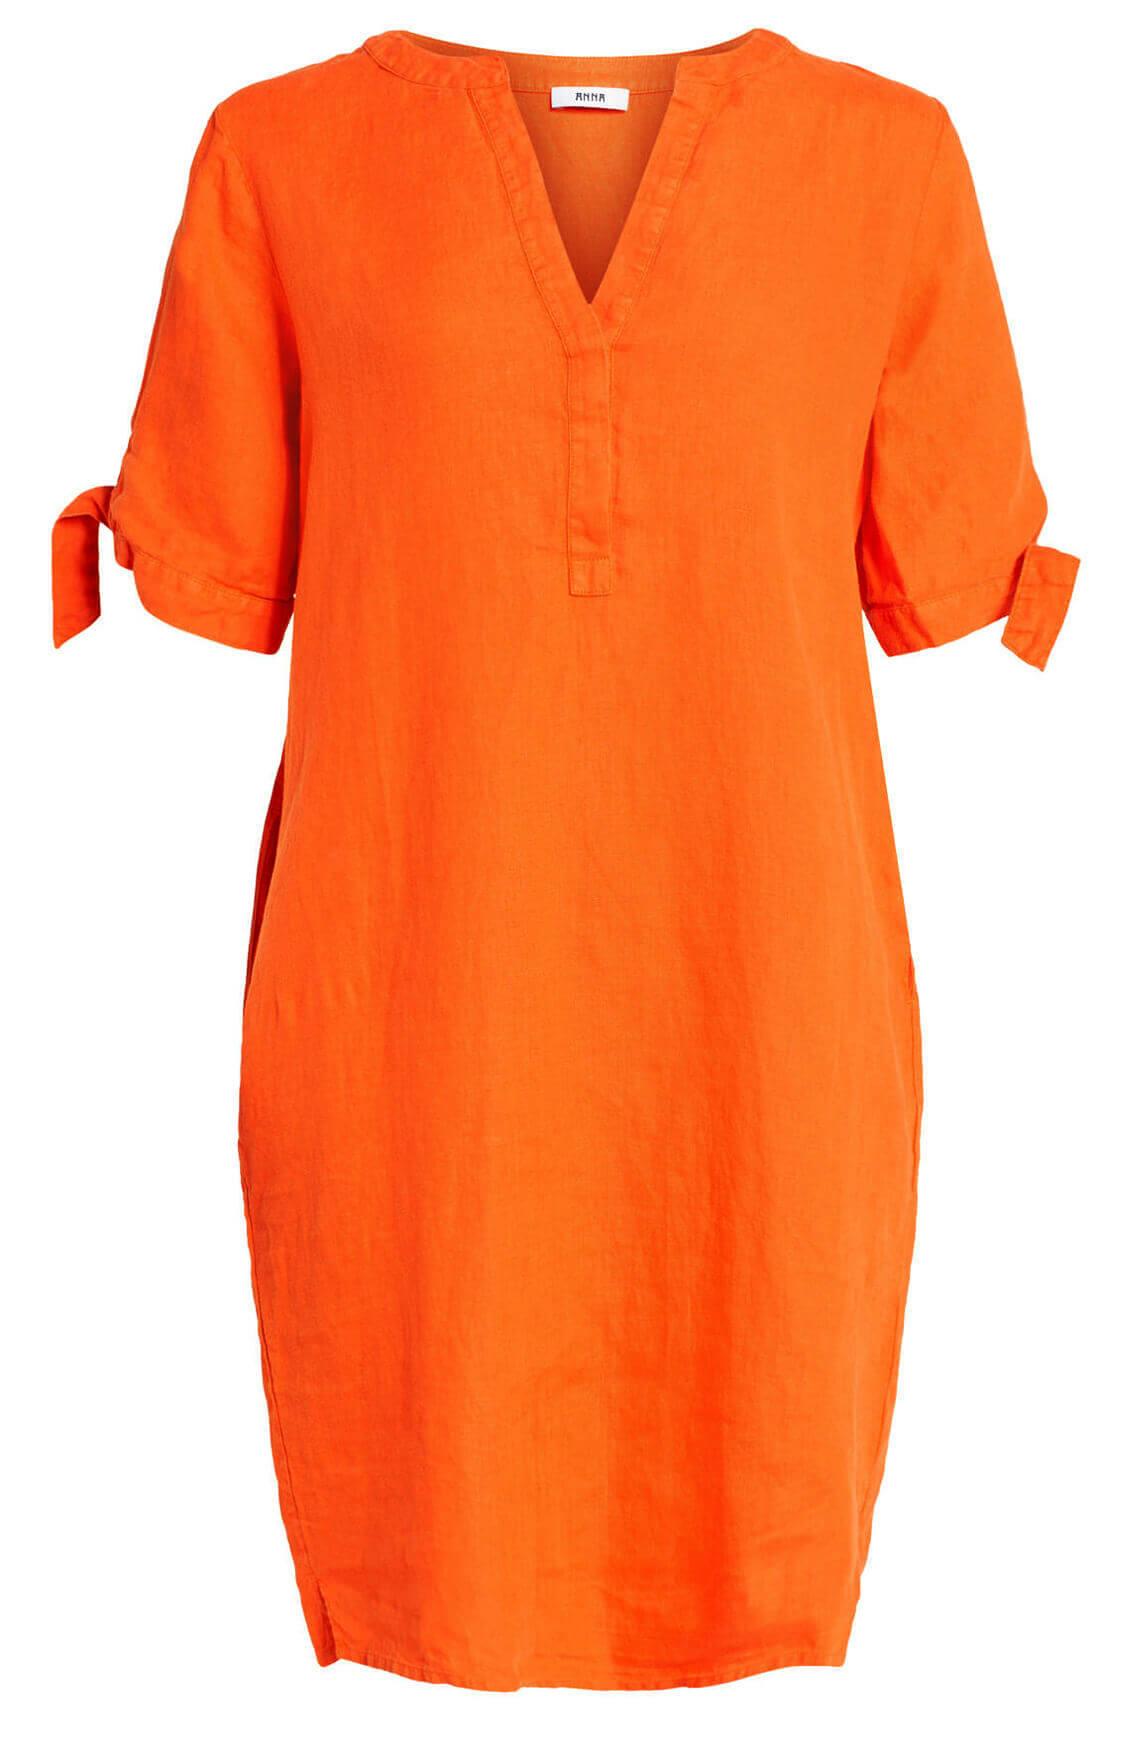 Anna Dames Linnen jurk met knoopdetail Oranje